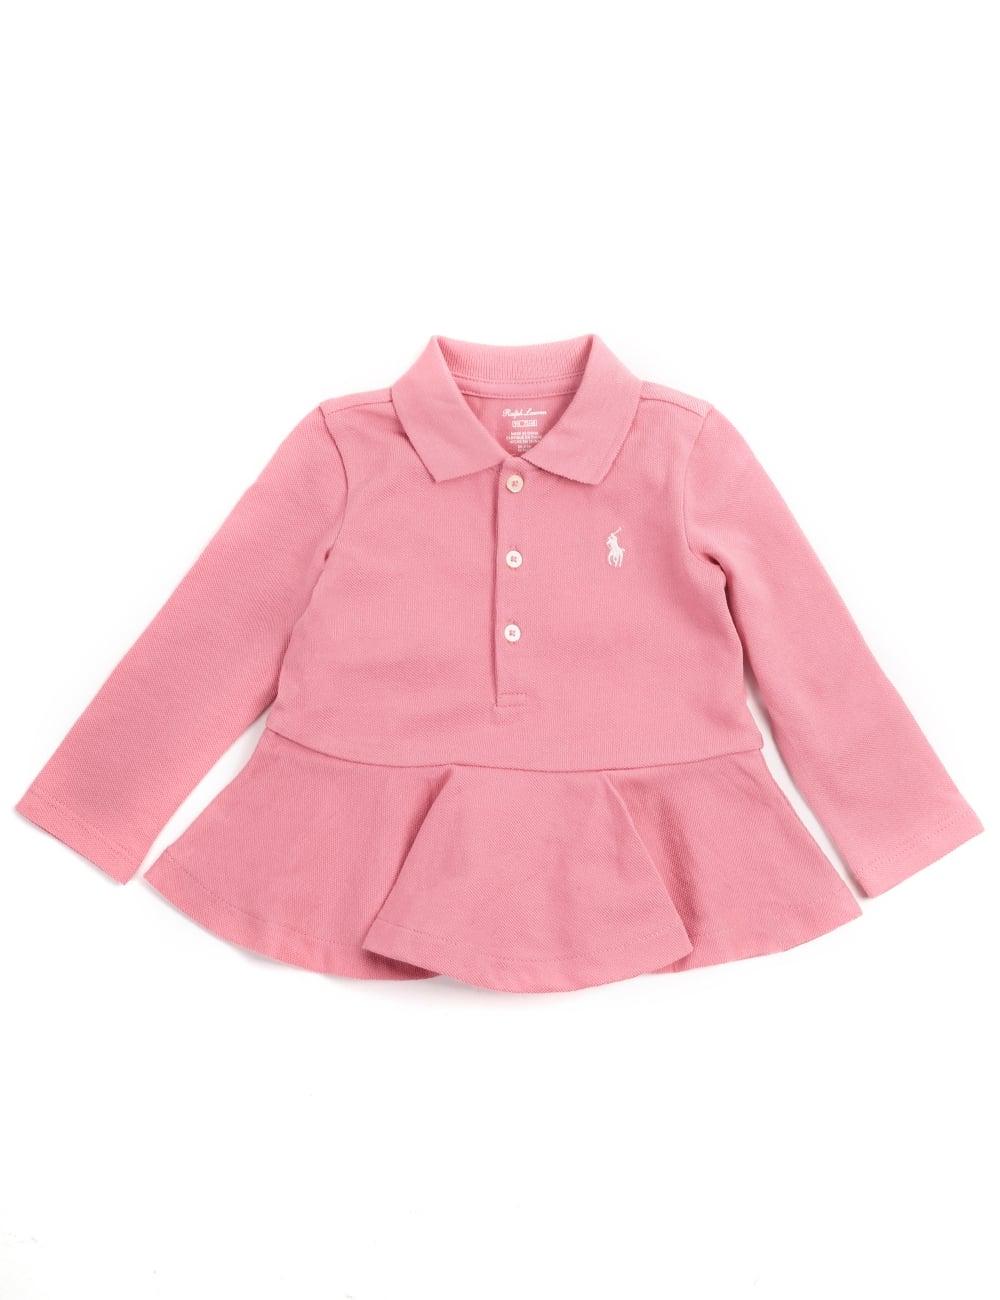 5a985129 Polo Ralph Lauren Baby Girls Frill polo Top